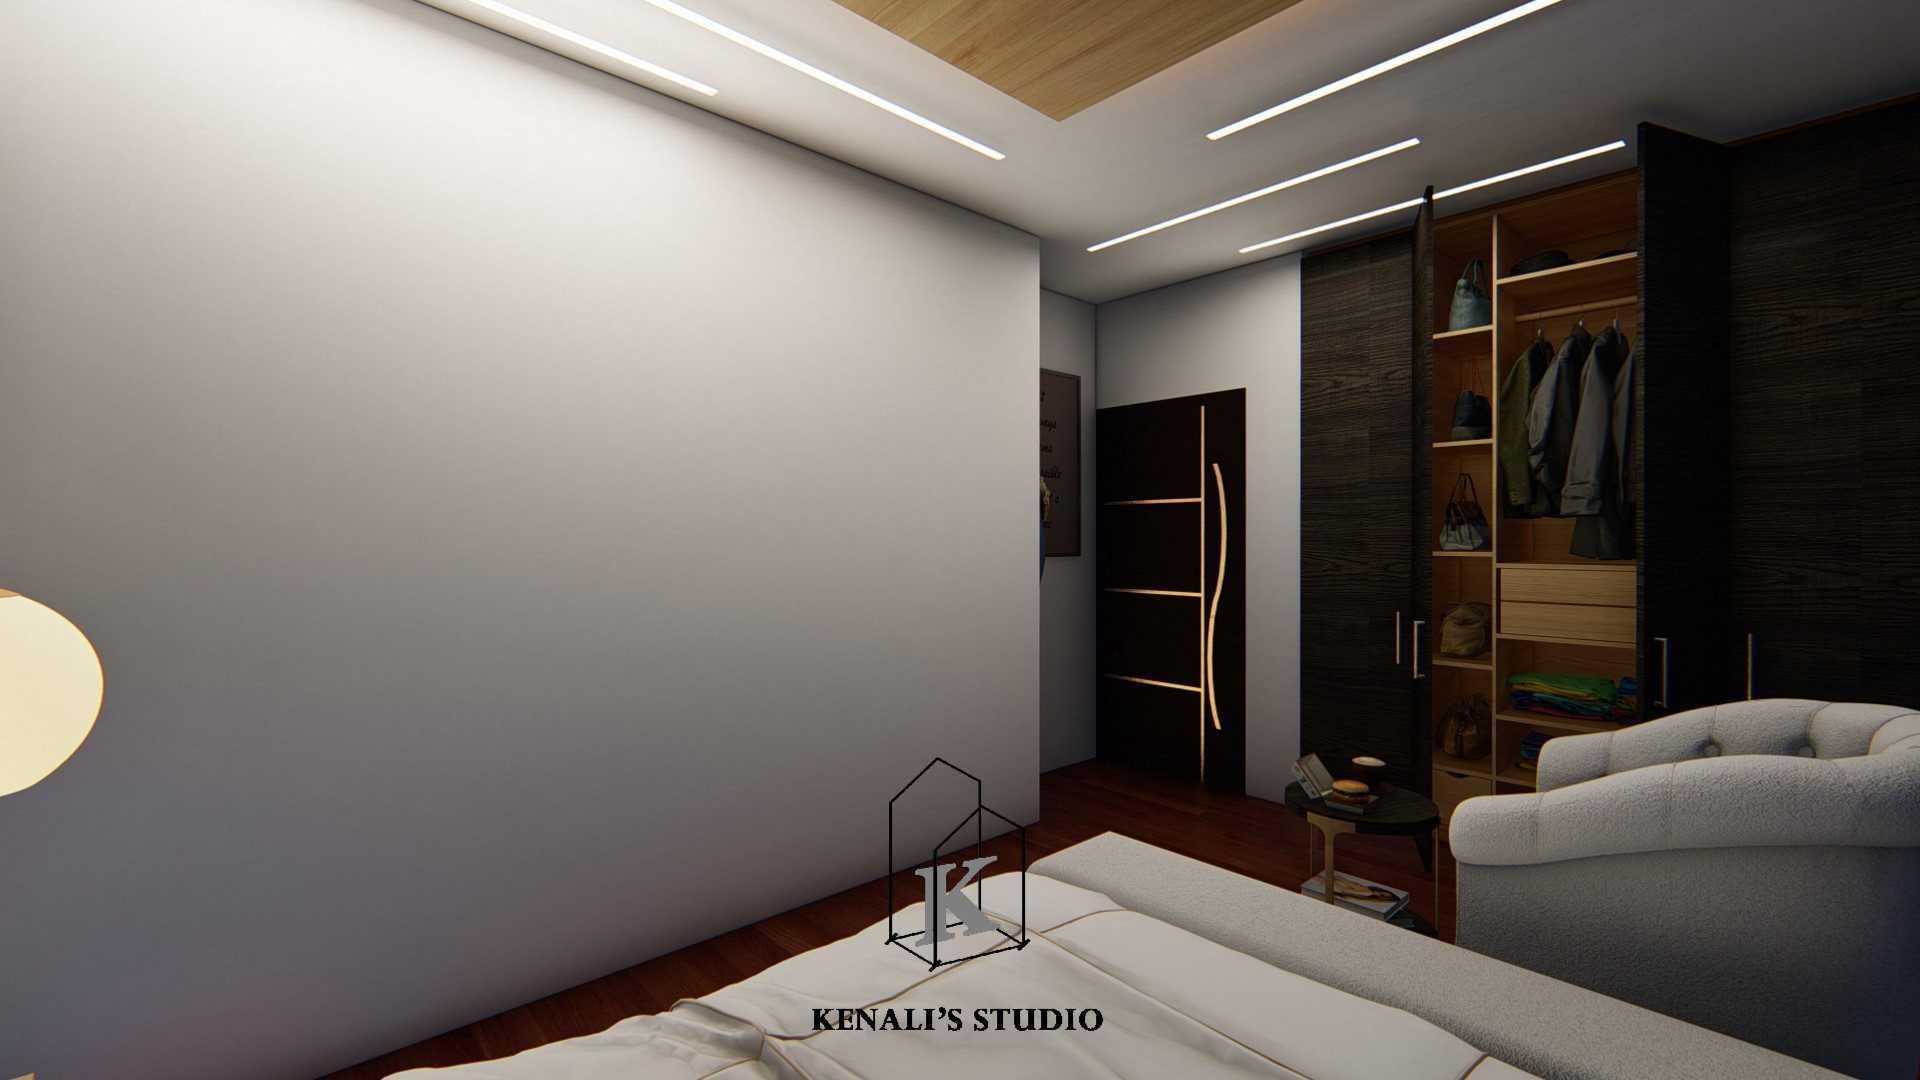 Kenali's Studio Project : Lowlit Bedroom Italia Italia Kenalis-Studio-Project-Lowlit-Bedroom  72931